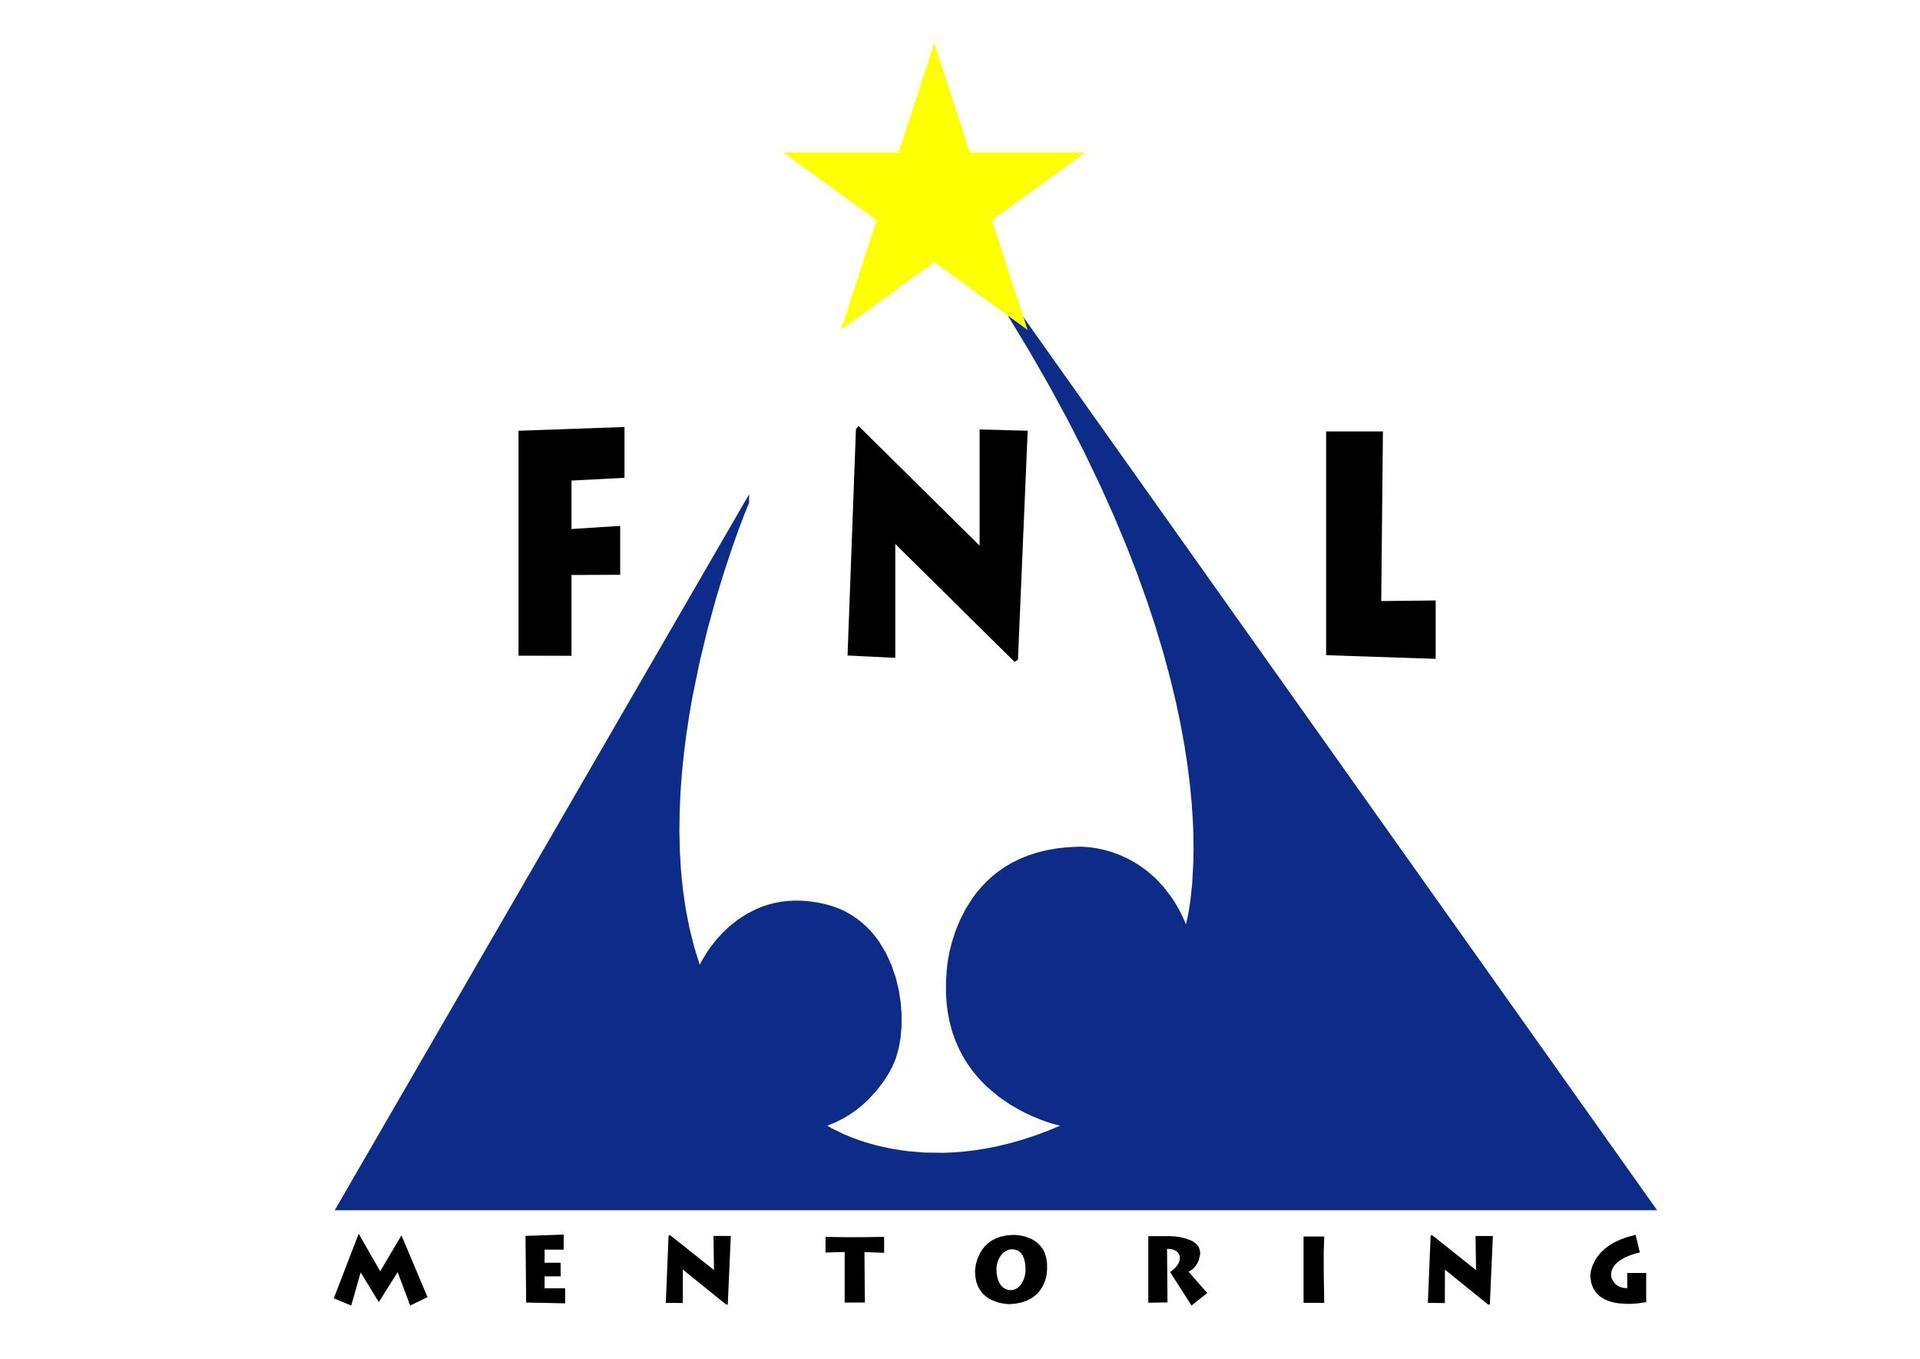 Friday Nigh Live Mentoring logo